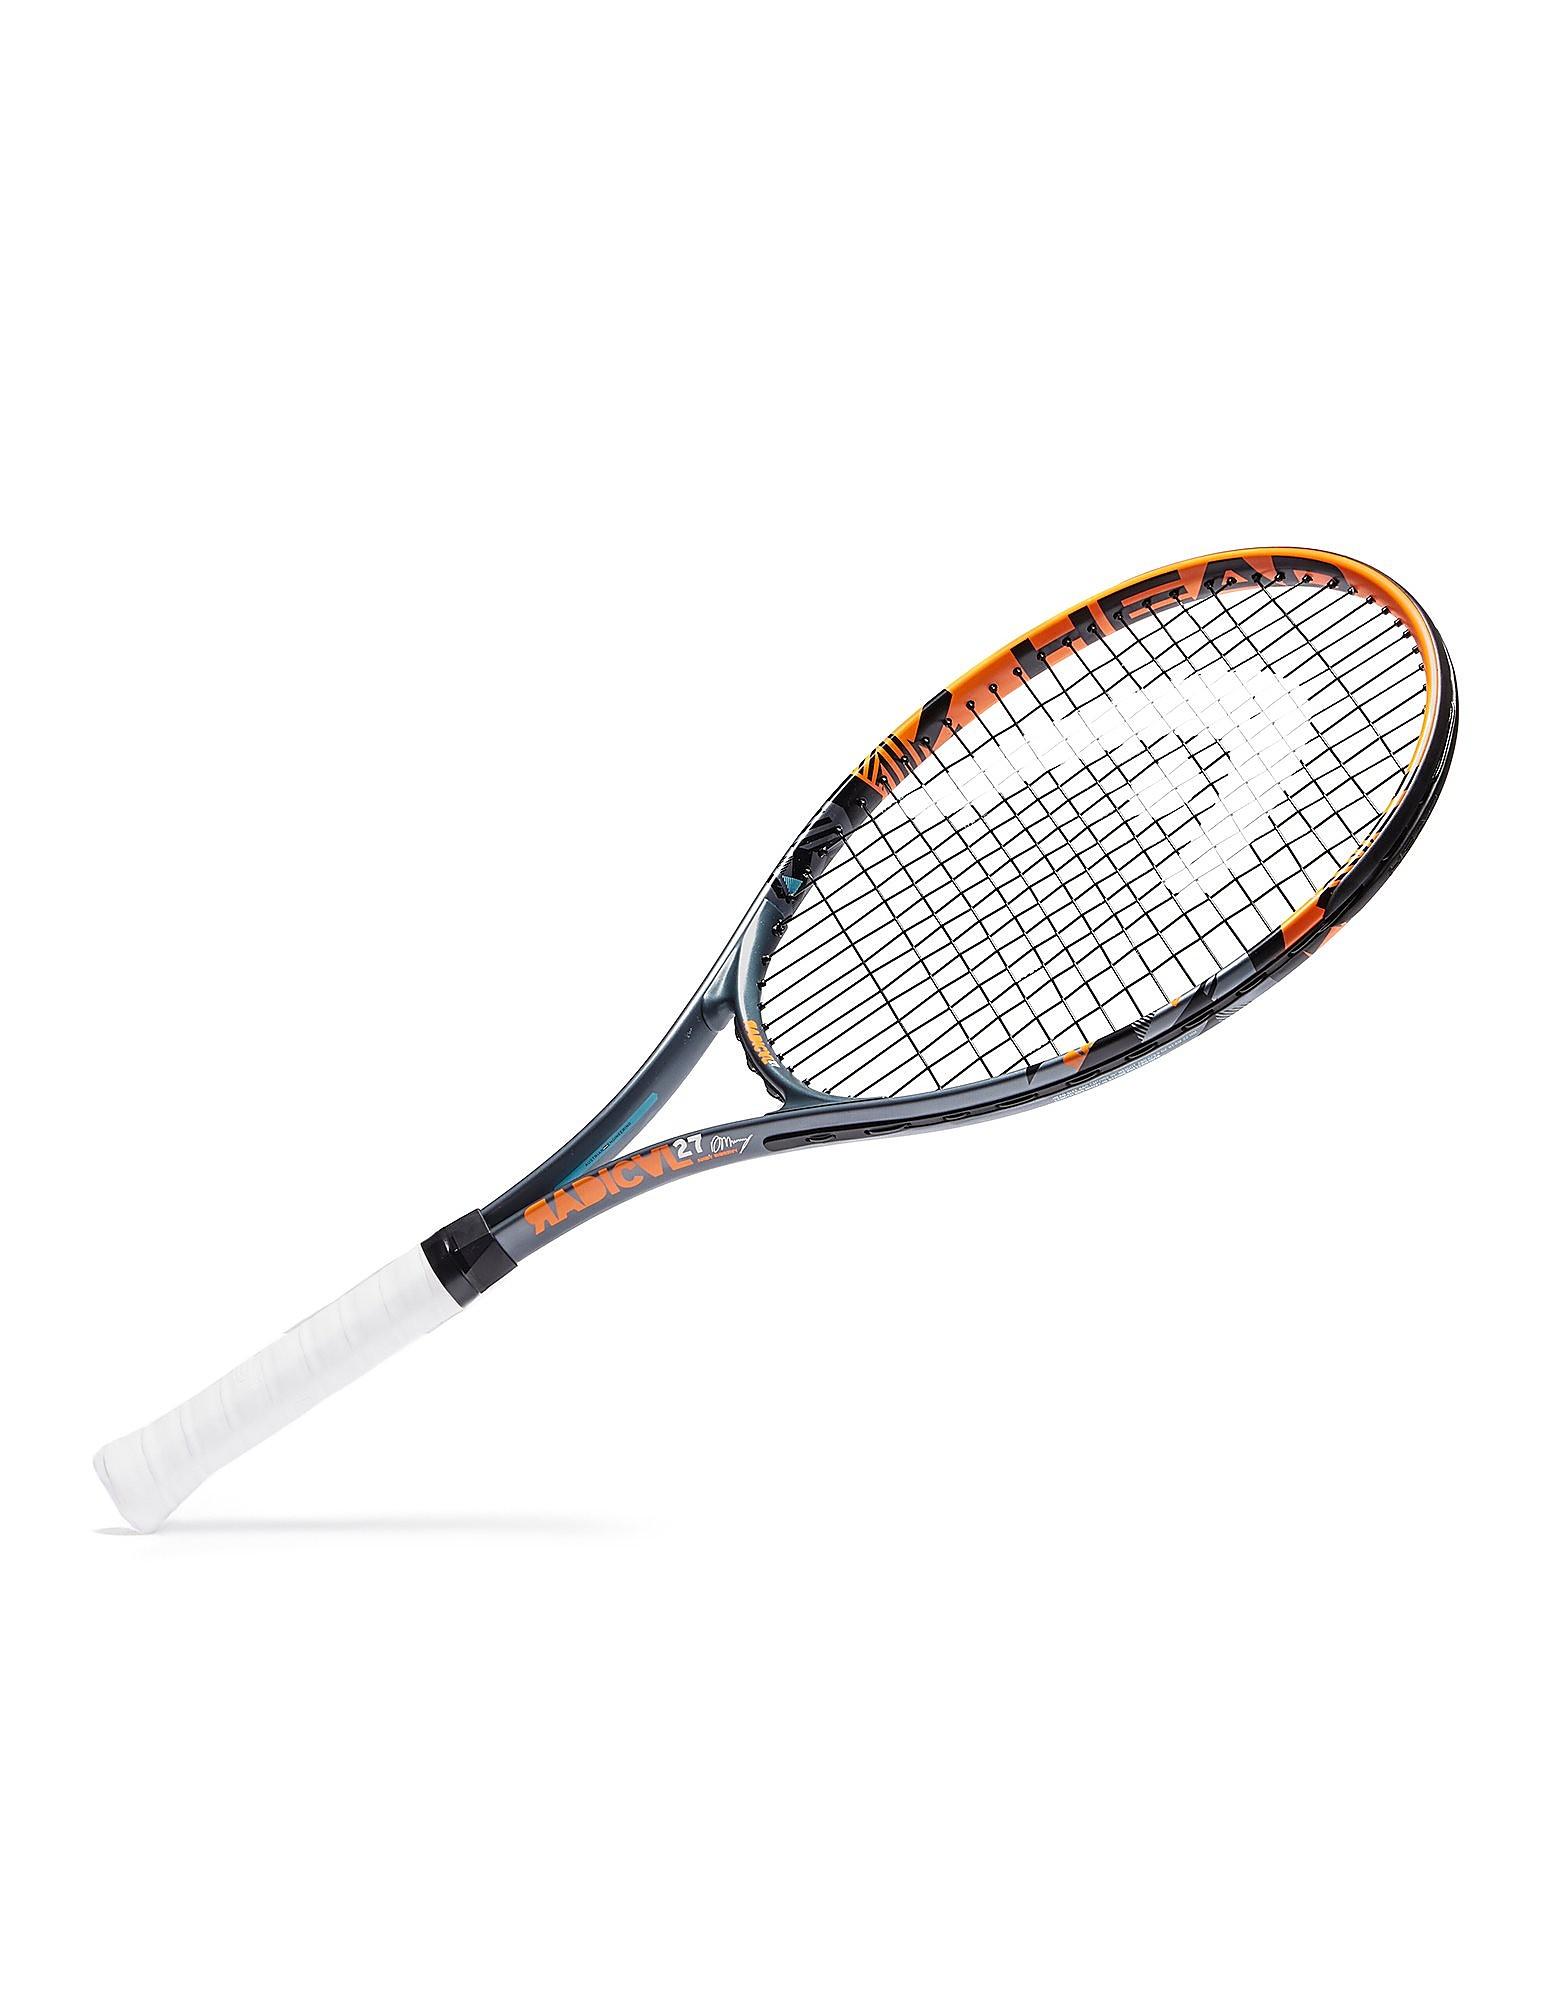 Head Radical 27 Tennis Racket